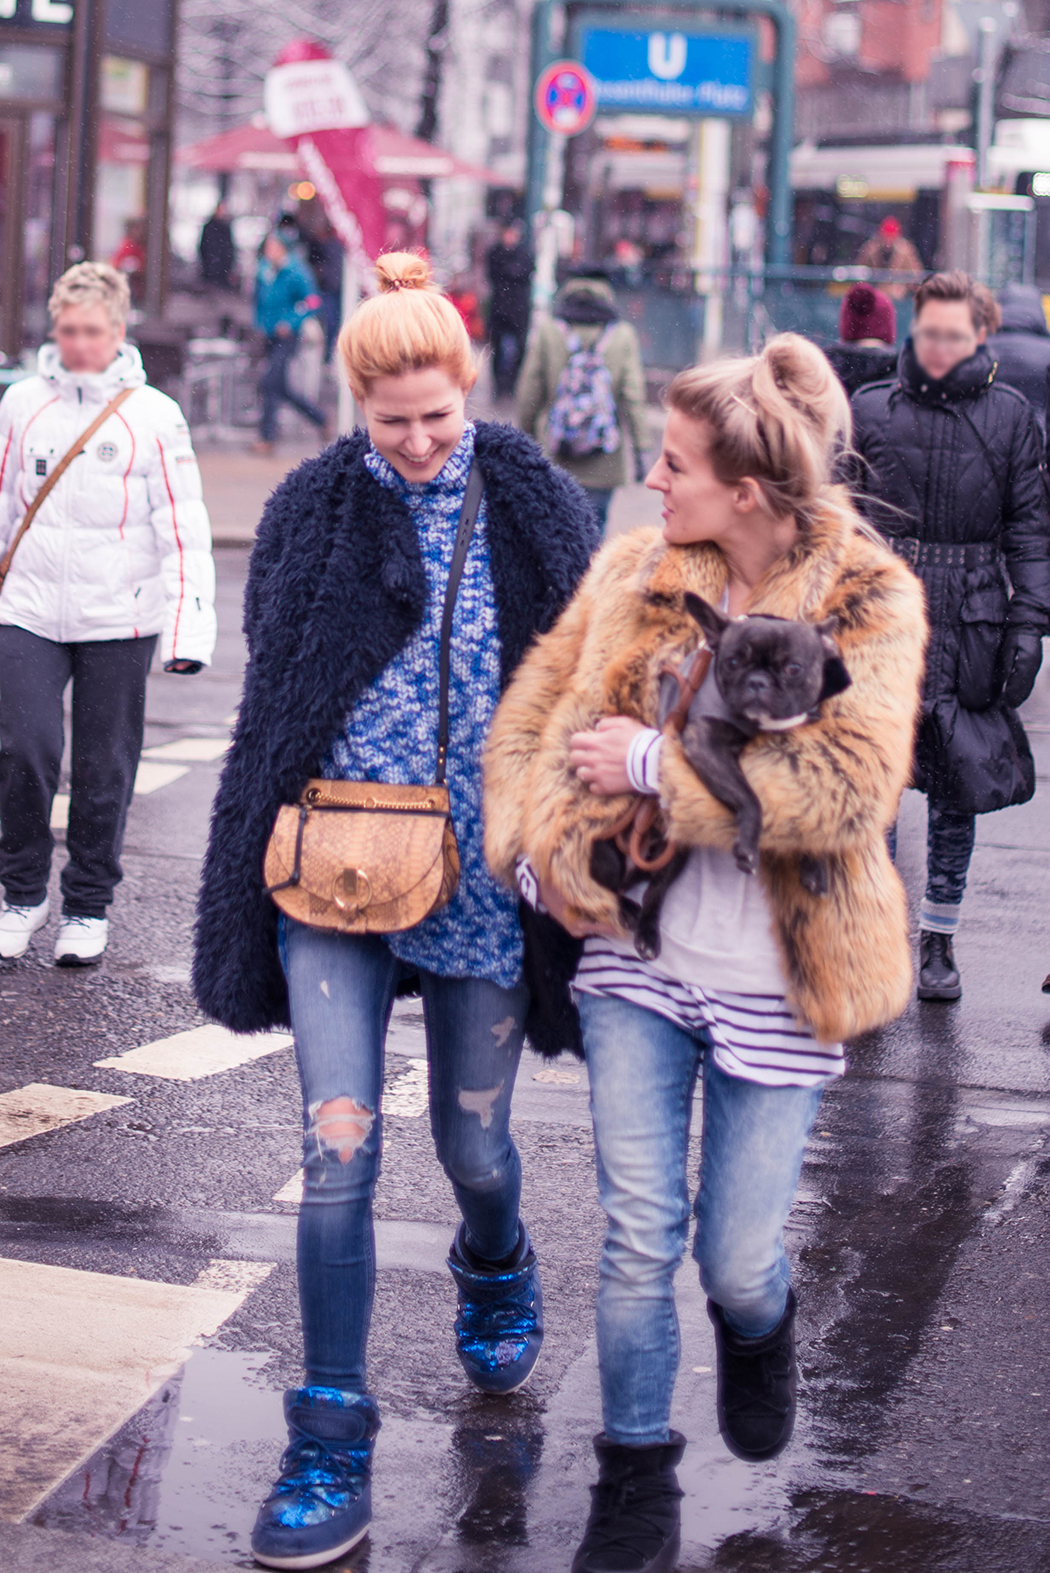 Fashionblog-Fashionblogger-Fashion-Blog-Blogger-Berlin-Deutschland-Daluma-Restaurant-vegan-glutenfrei-6